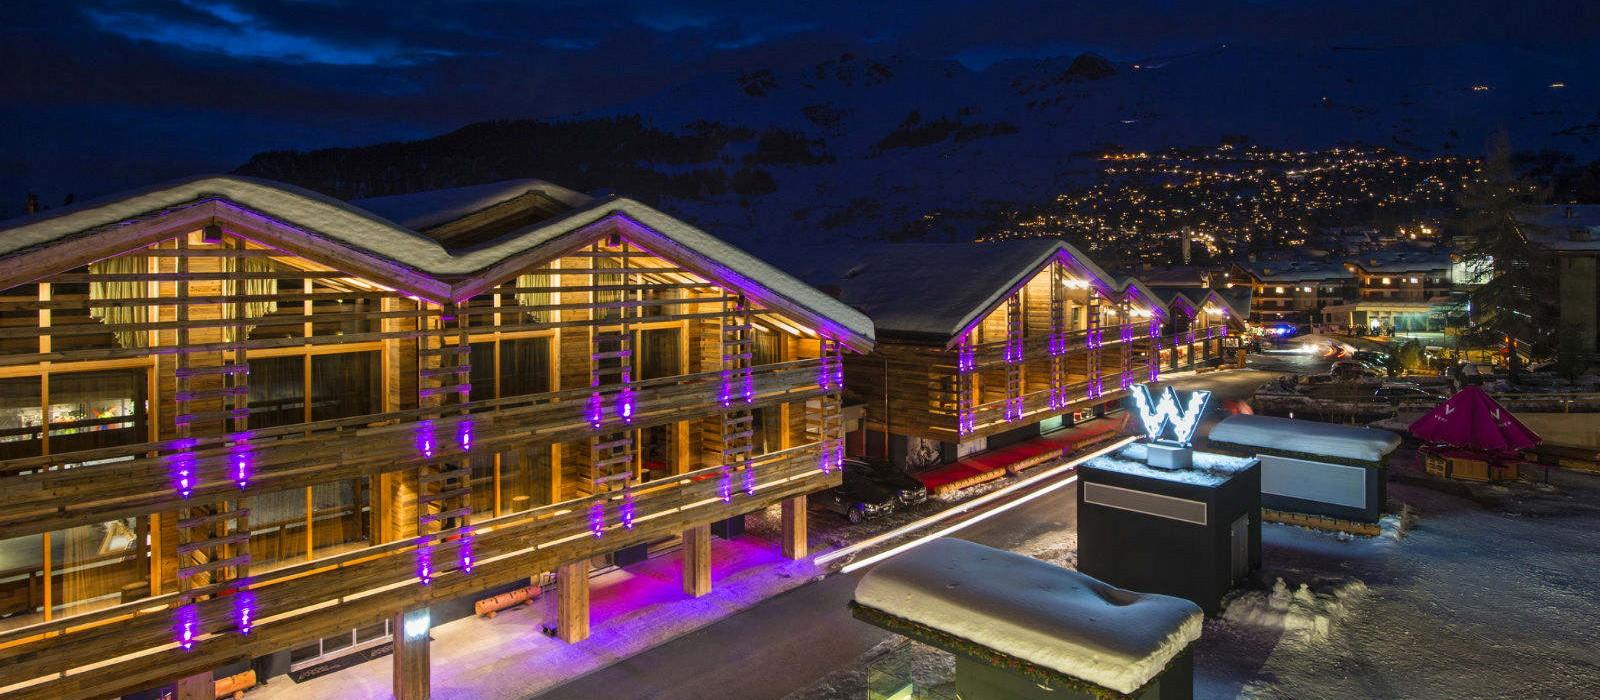 header - w verbier - luxury ski resorts